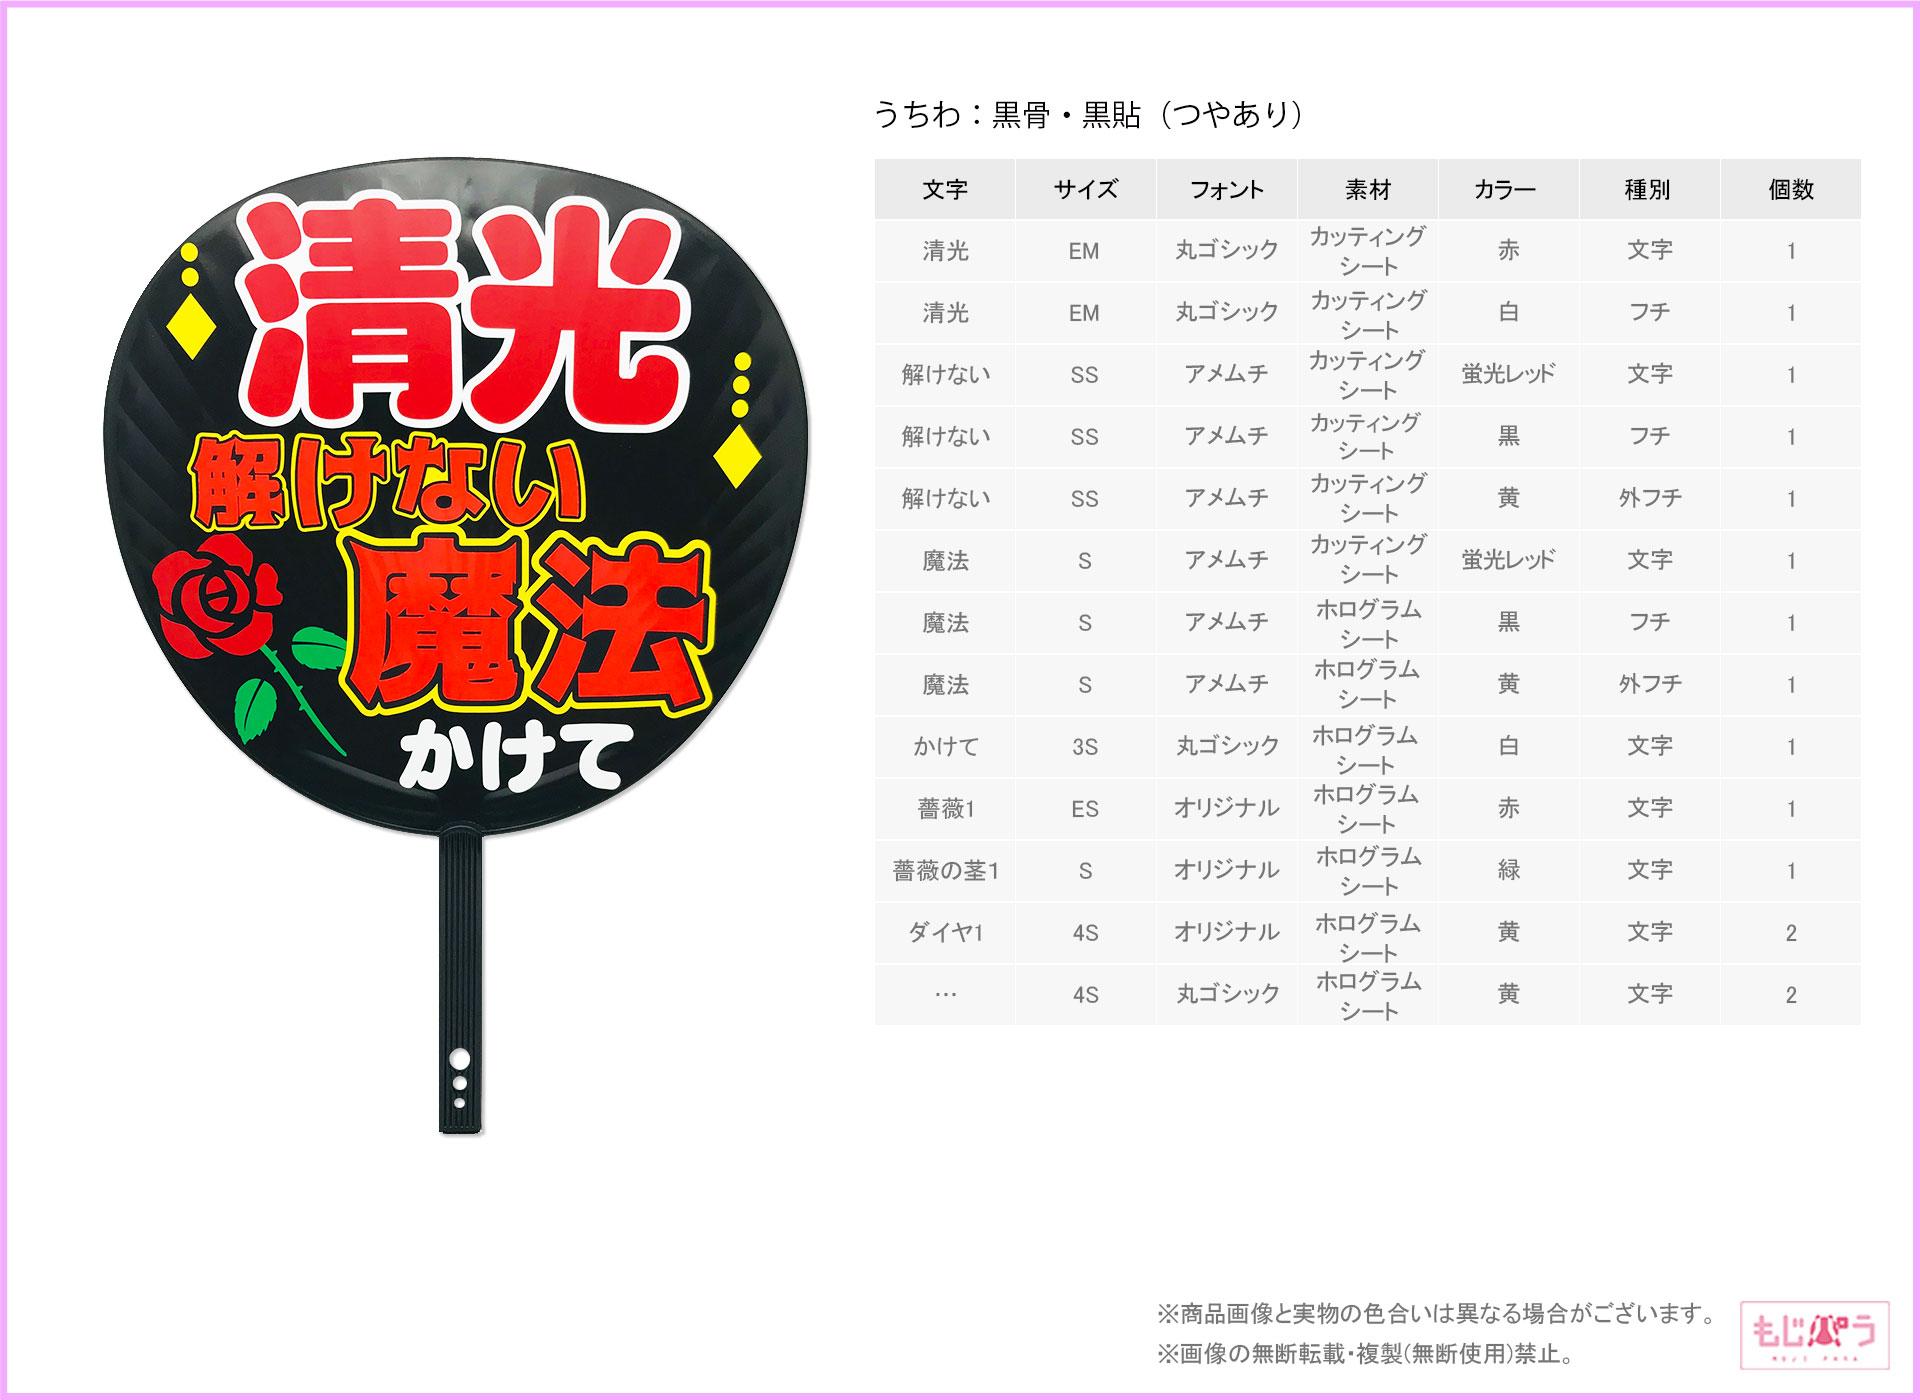 decouchiwa100-007-00001画像